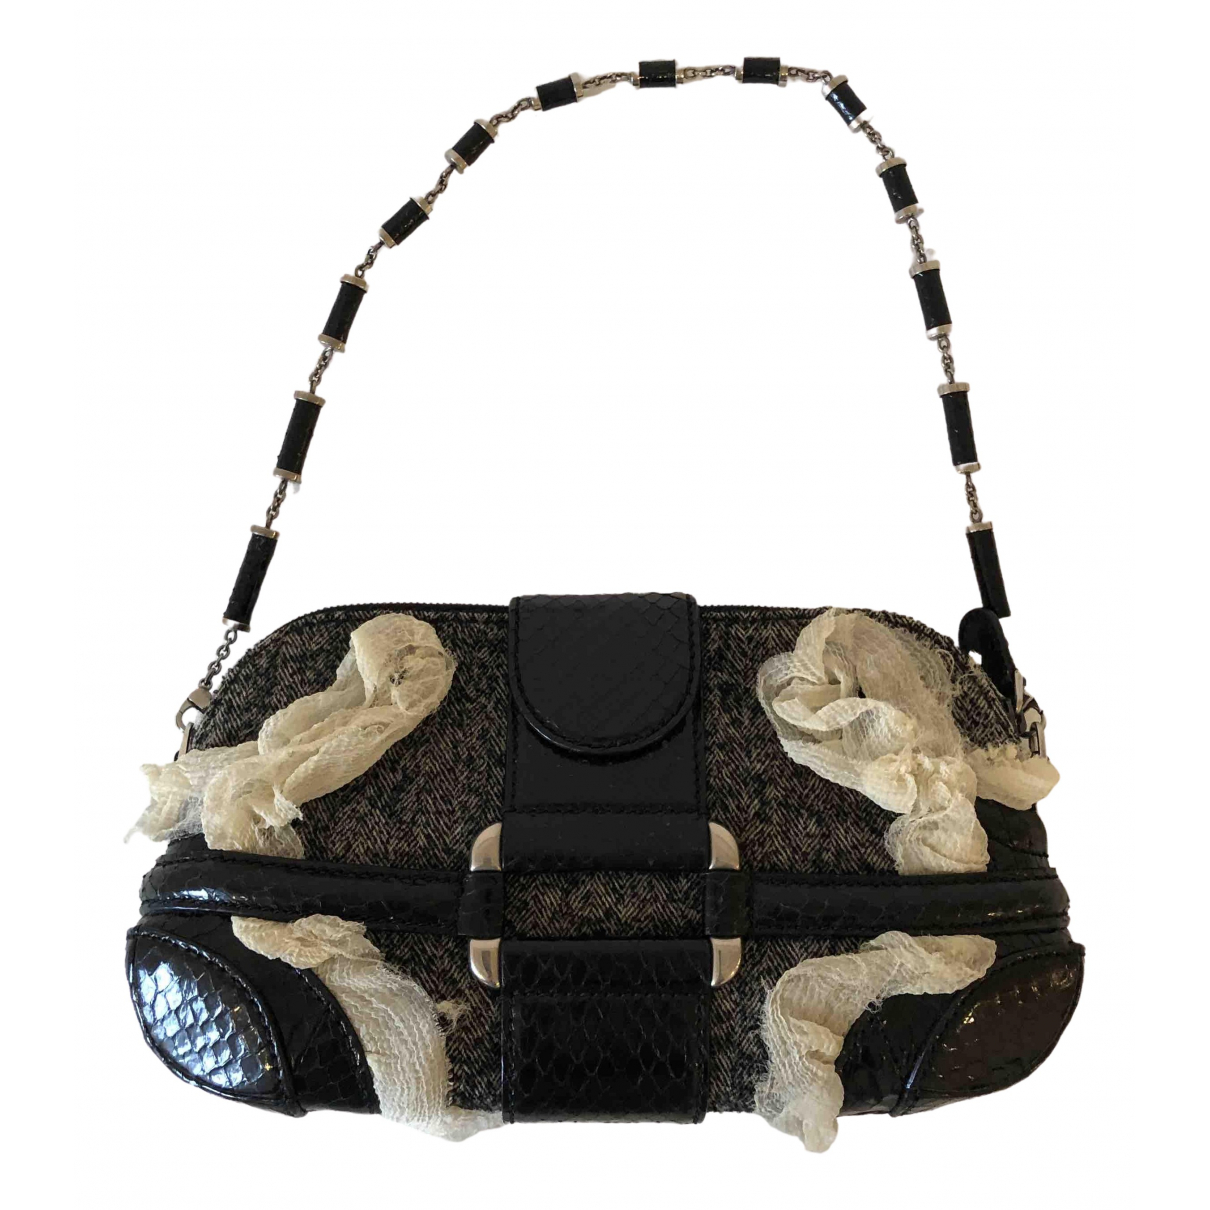 Alexander Mcqueen \N Grey Leather handbag for Women \N